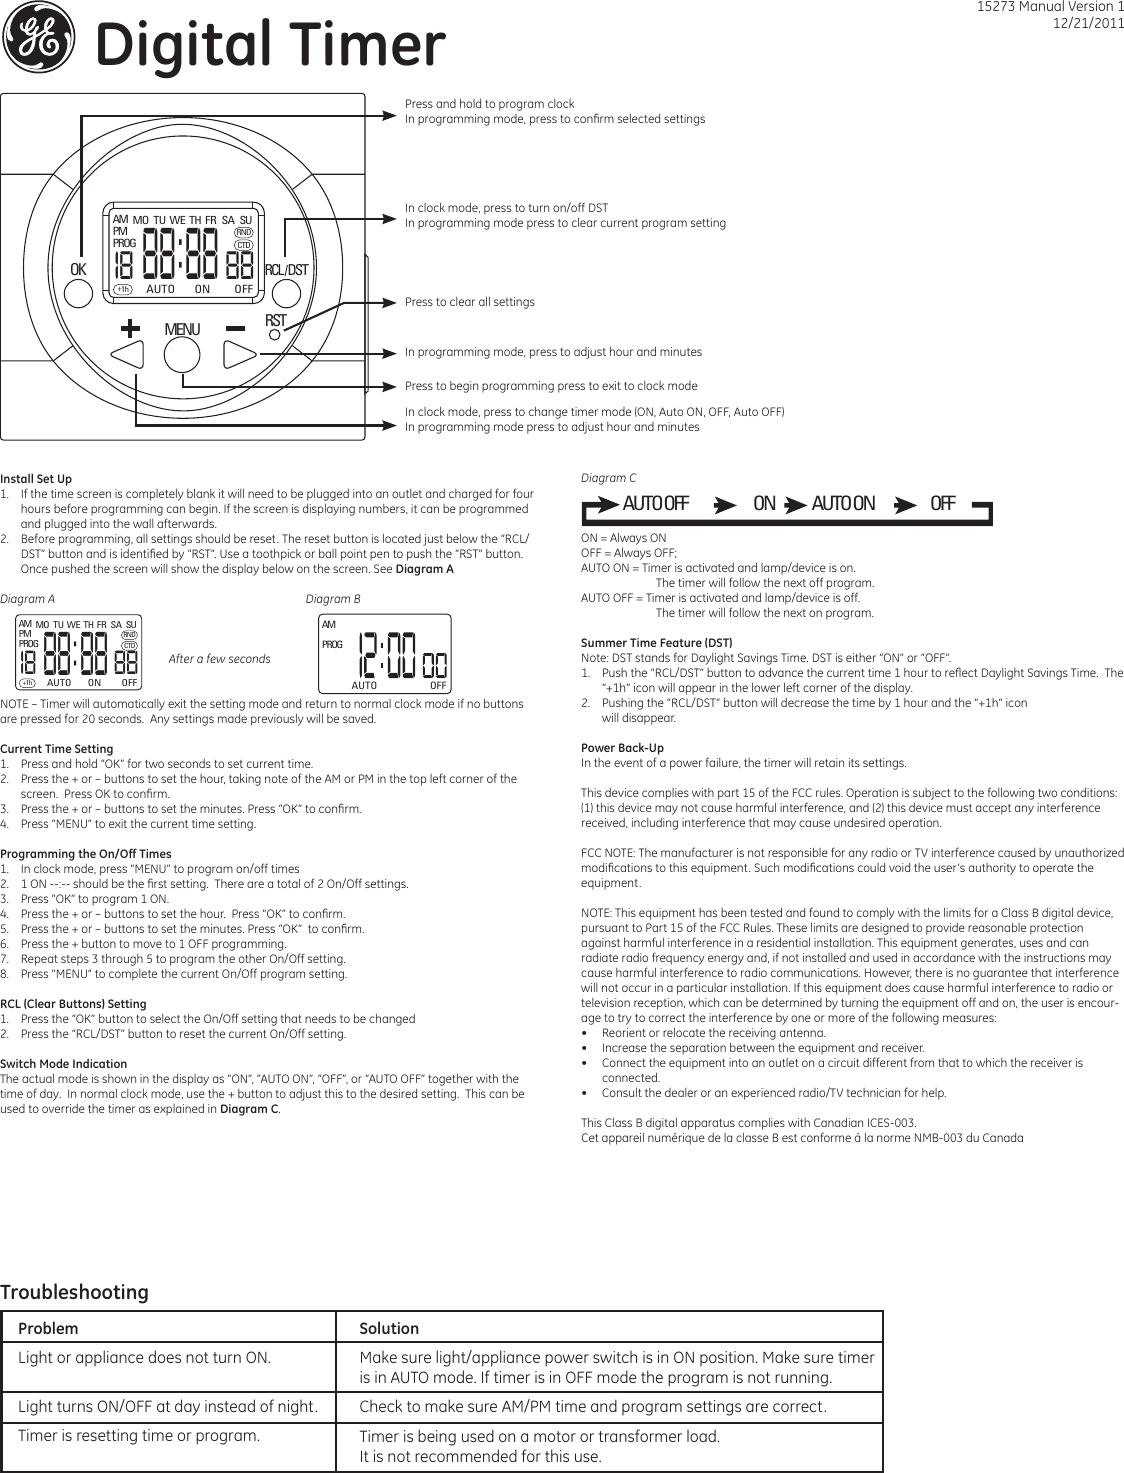 Ge Appliances 15273 Plugin 7day Digital Timer Owners Manual